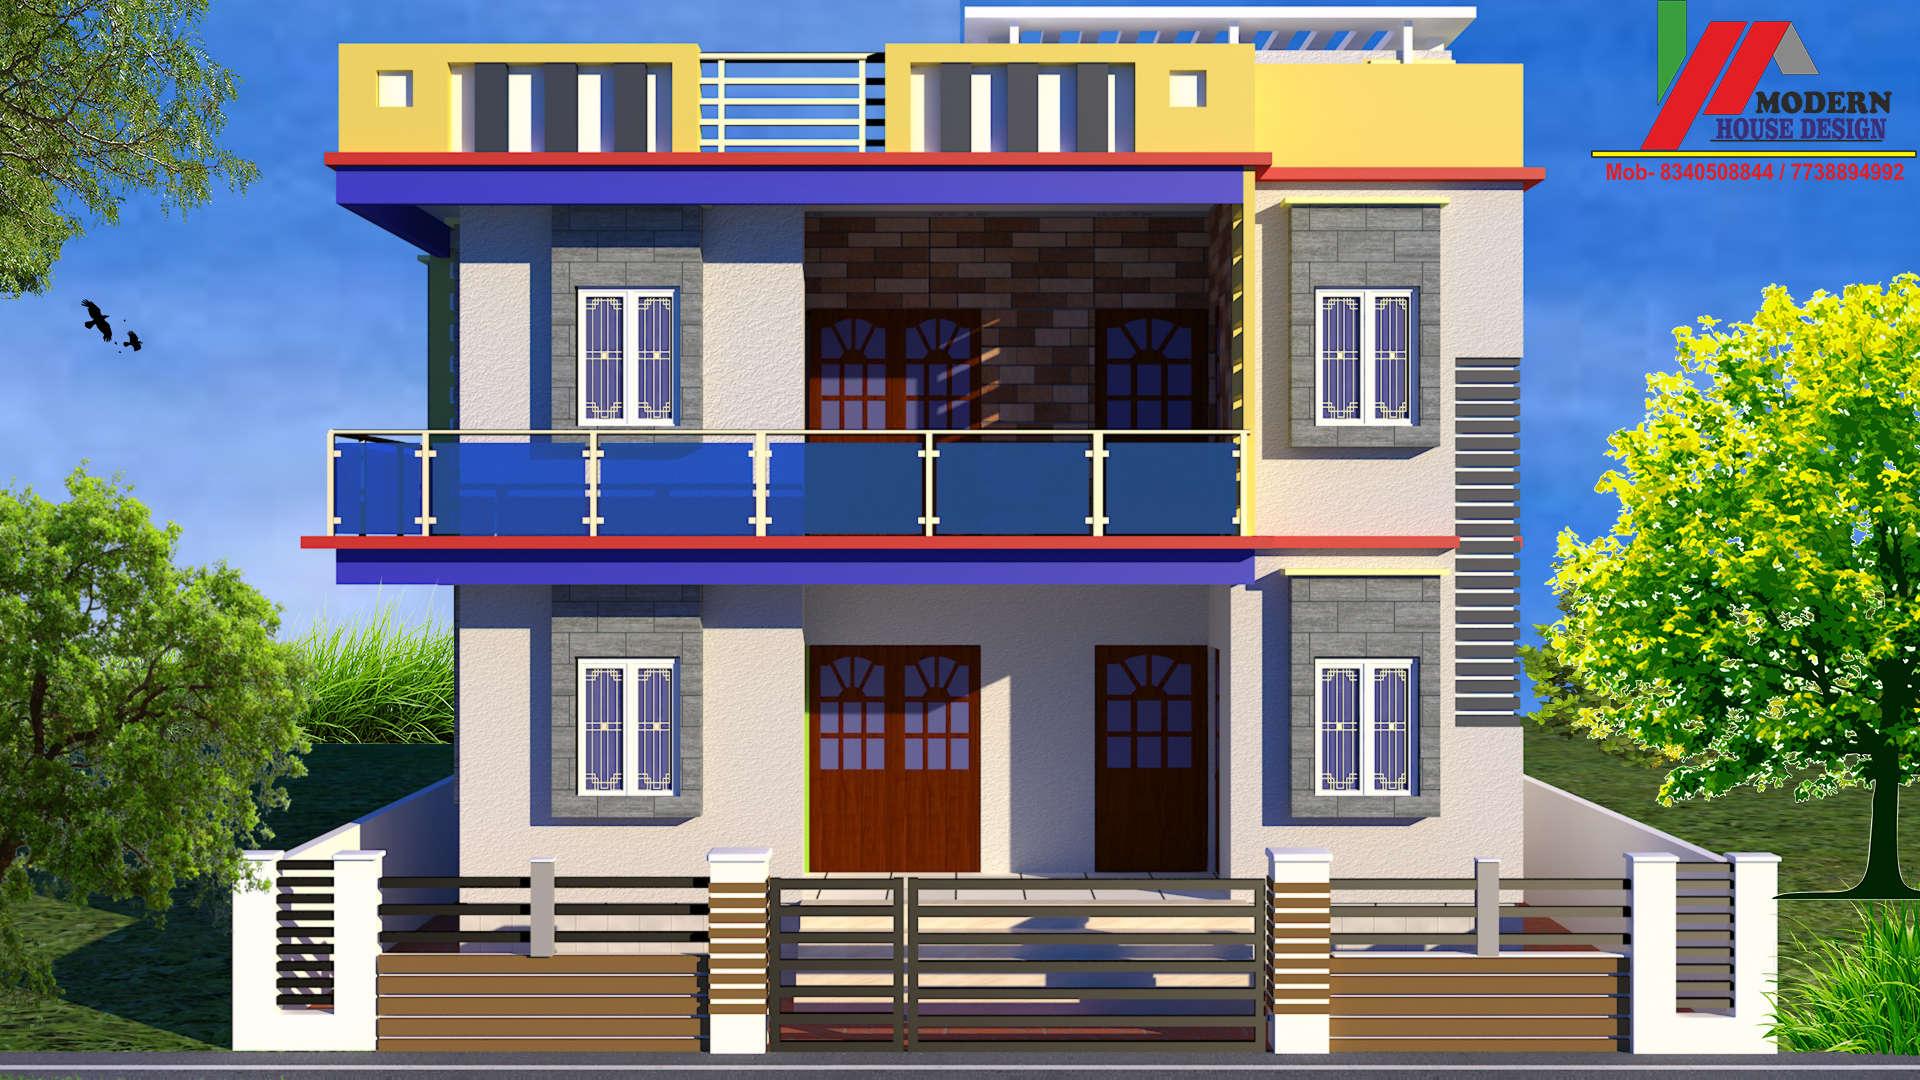 Modern House Design Durga Sthan Manddir Architects In Muzaffarpur Justdial